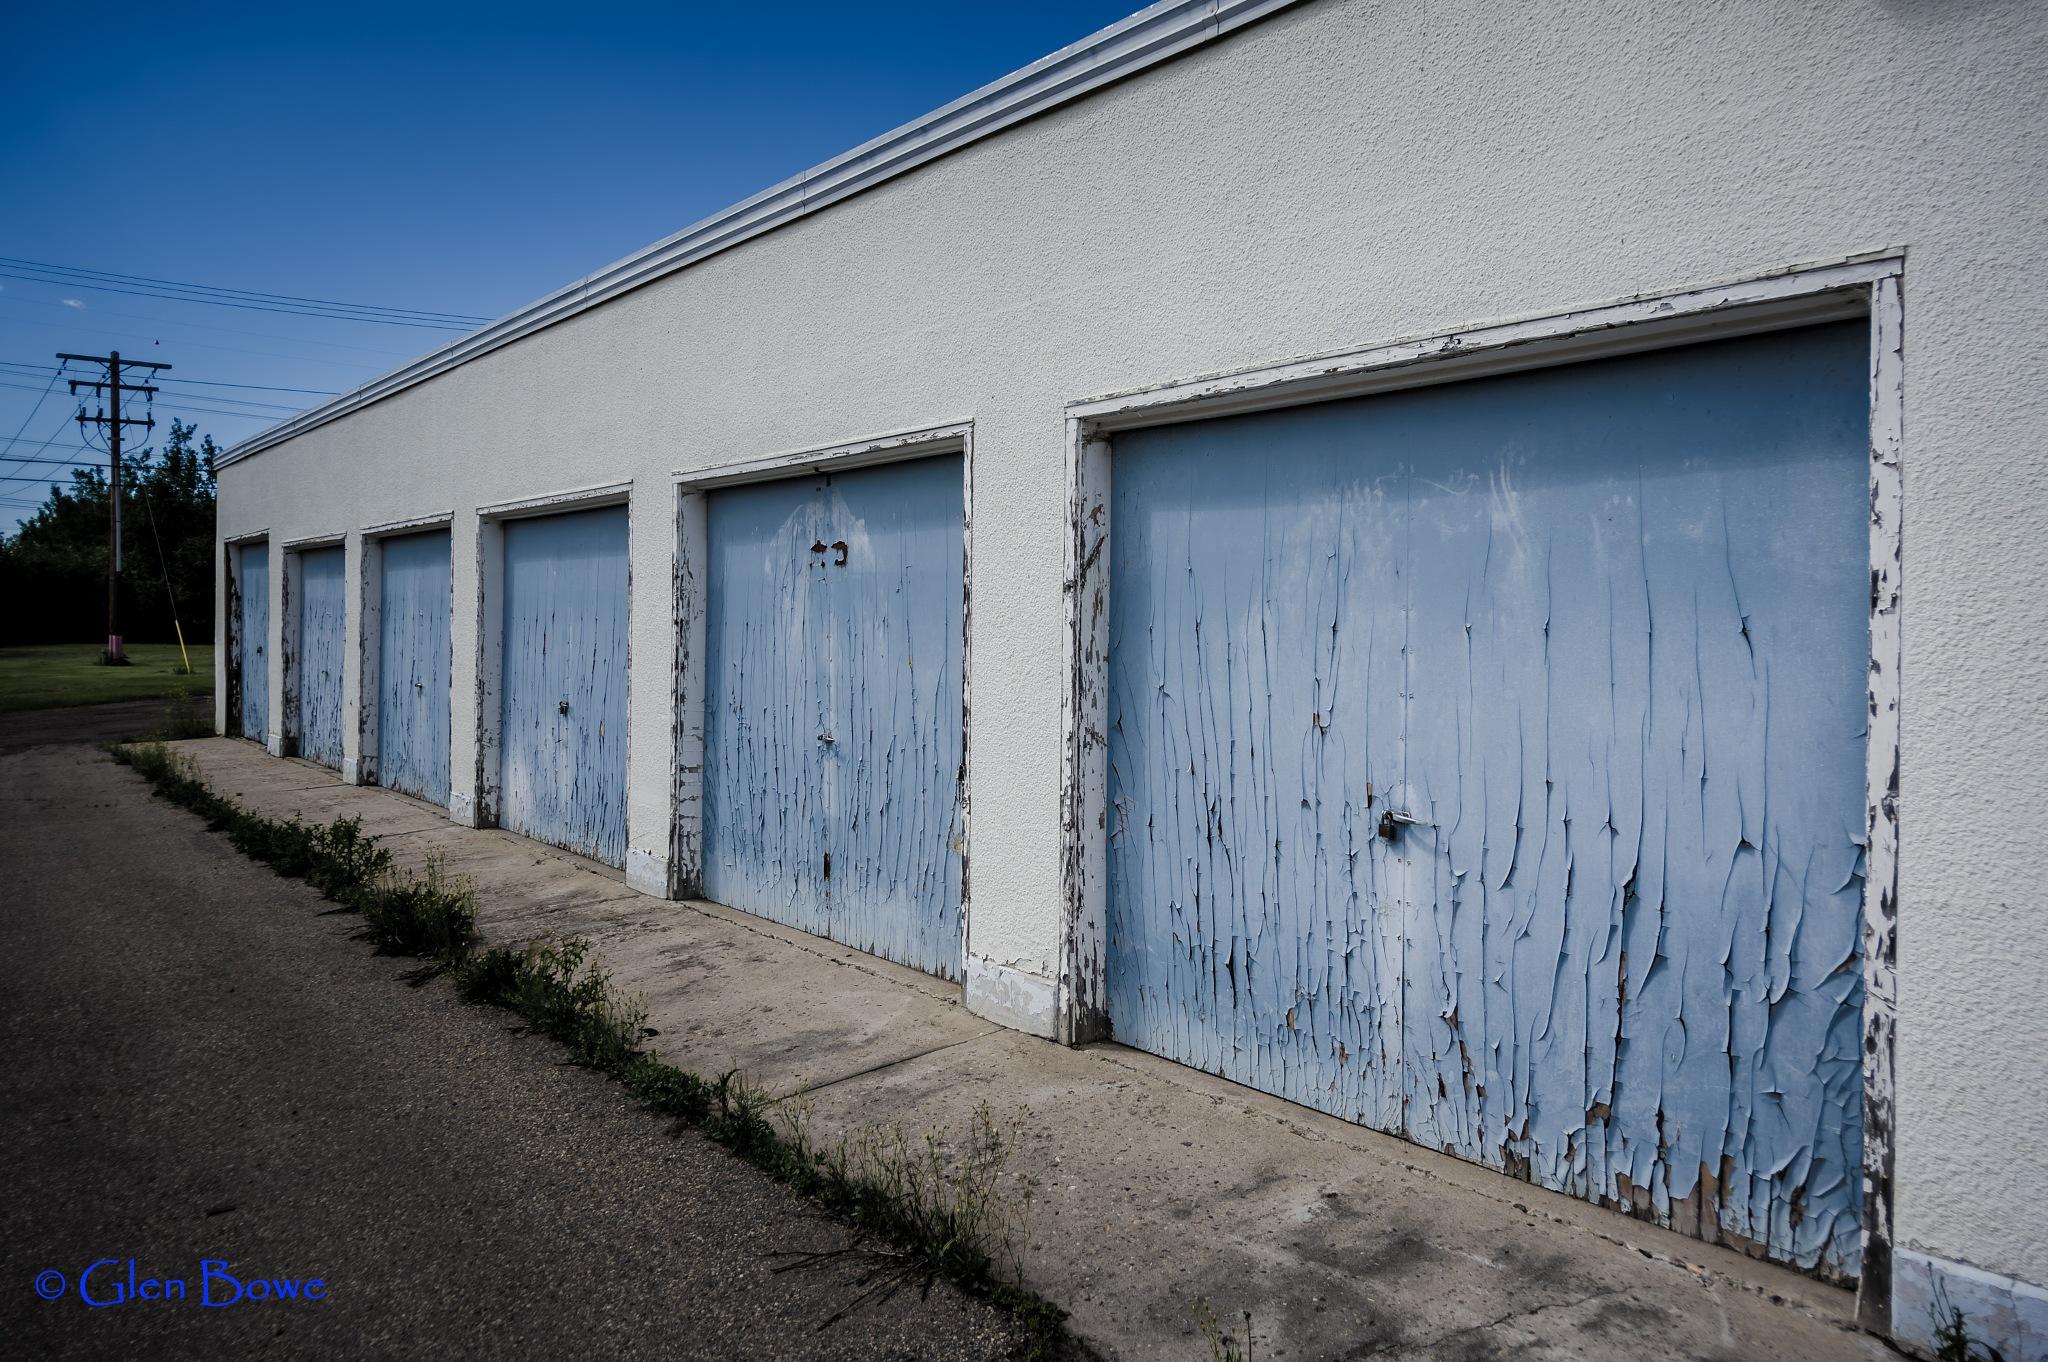 Many Doors by Glen Bowe